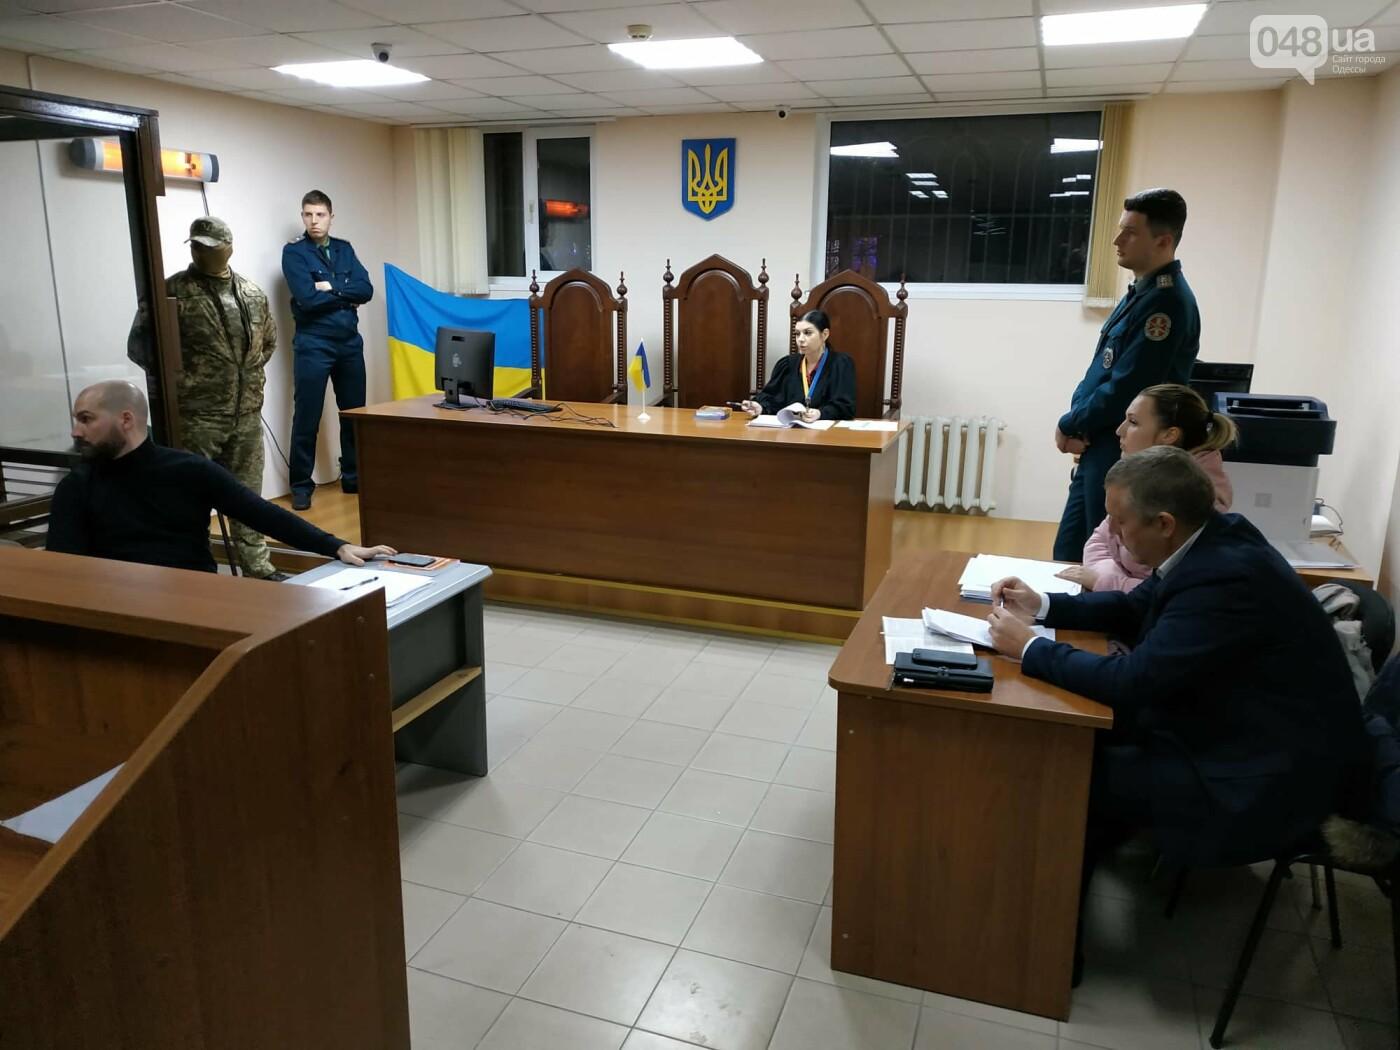 Одесскому псевдо-активисту избрали меру пресечения, - ФОТО, фото-4, Фото: Александр Жирносенко